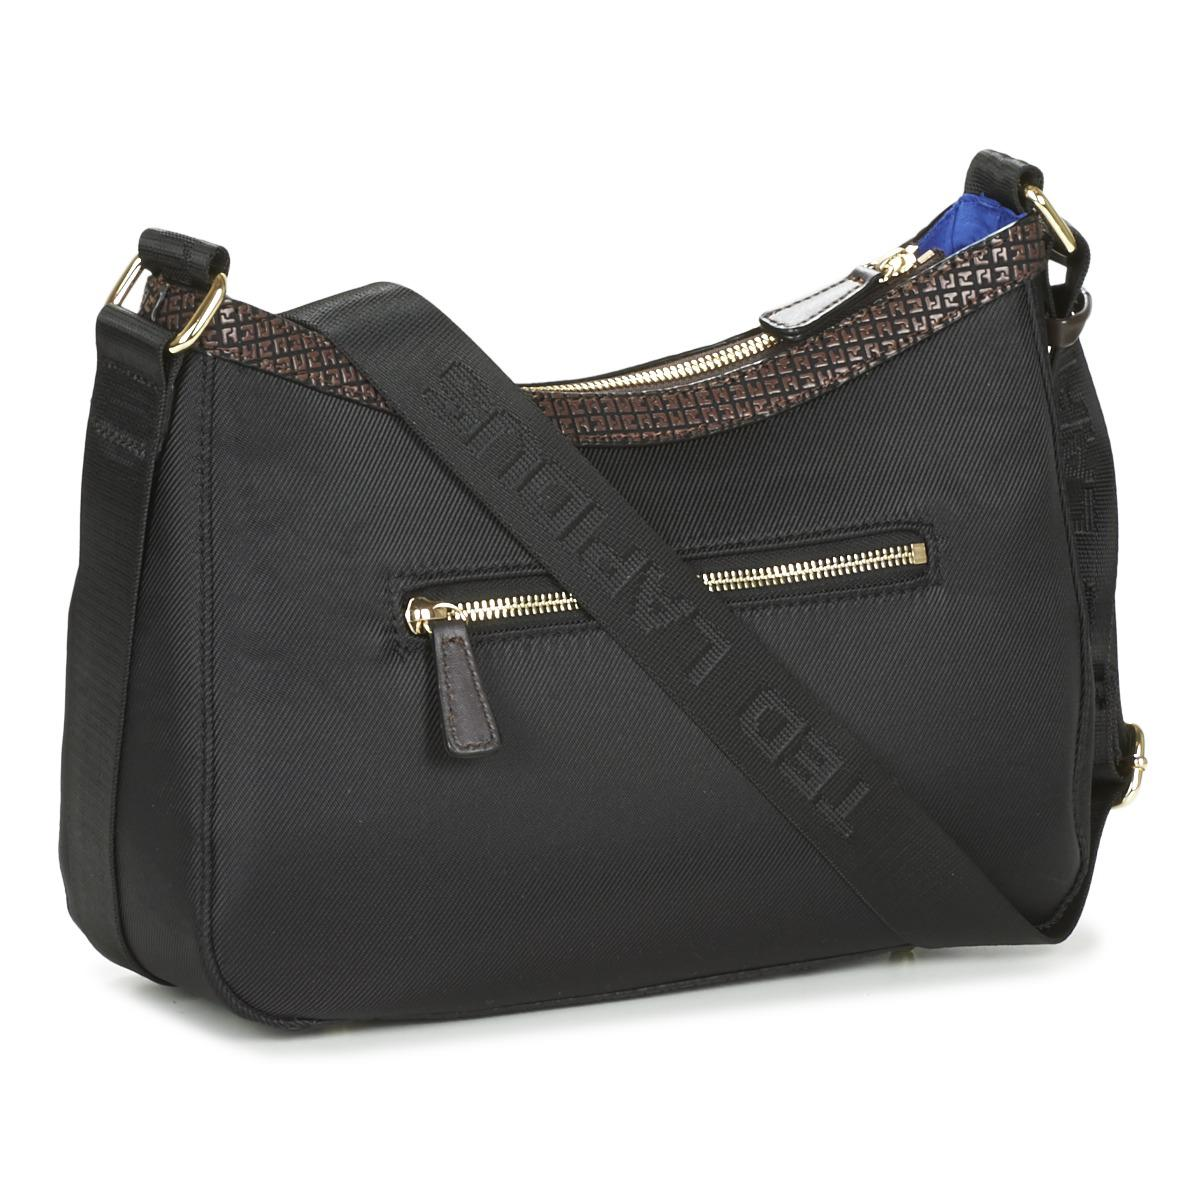 Ted Lapidus Black Cancale Shoulder Bag Lyst View Fullscreen